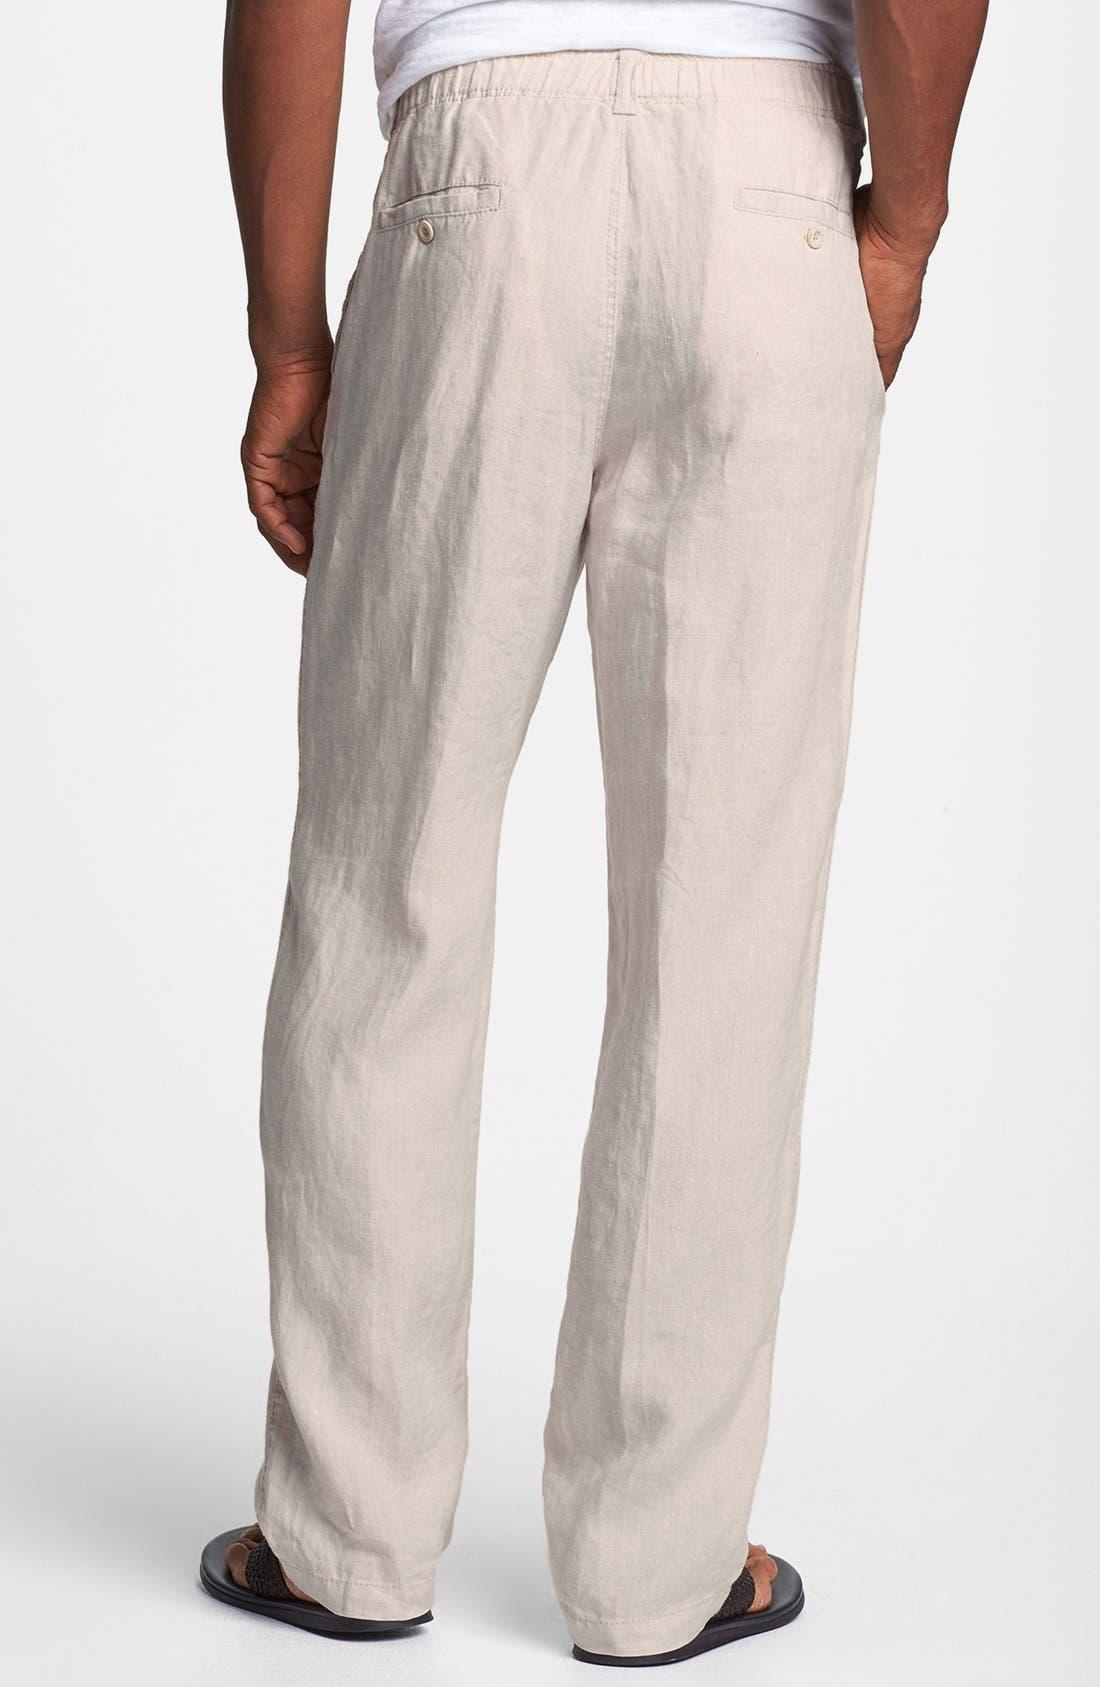 New Linen on the Beach Linen Pants,                             Alternate thumbnail 2, color,                             Natural Linen